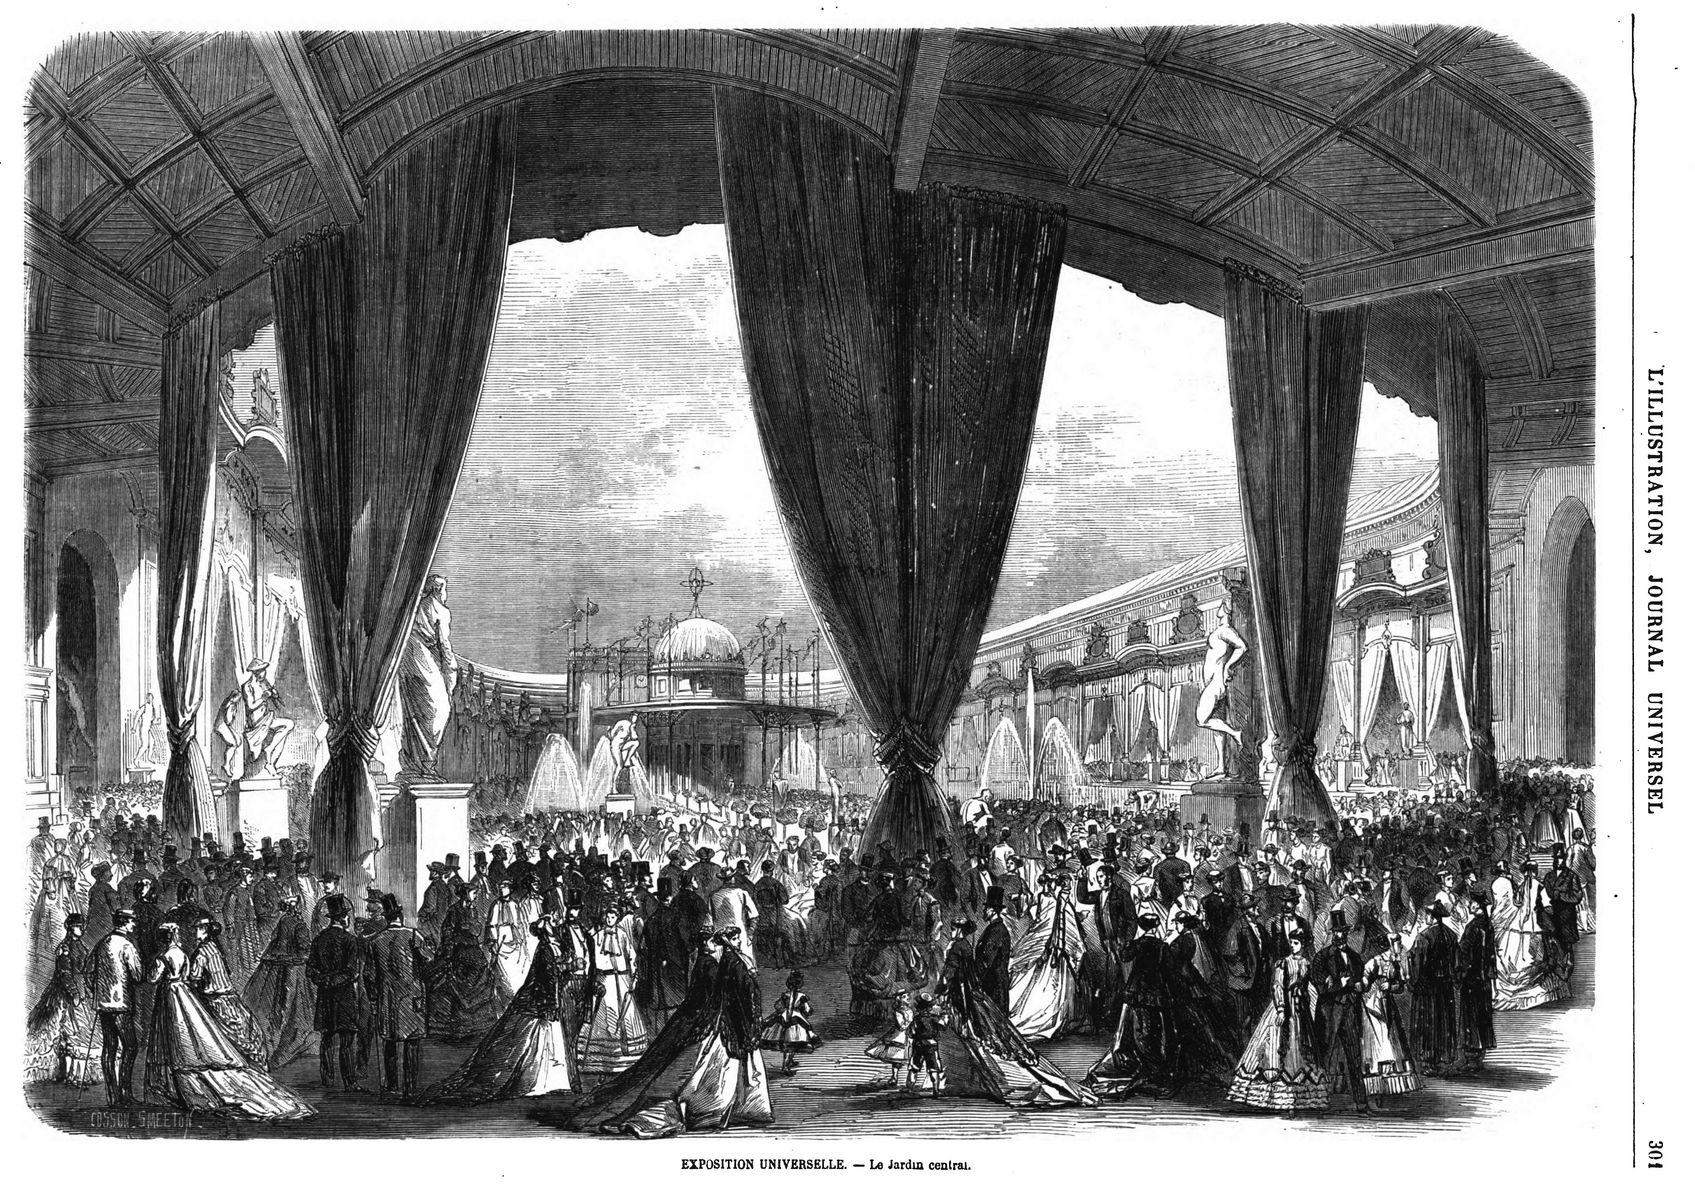 EXP0SITI0N UNIVERSELLE 1867